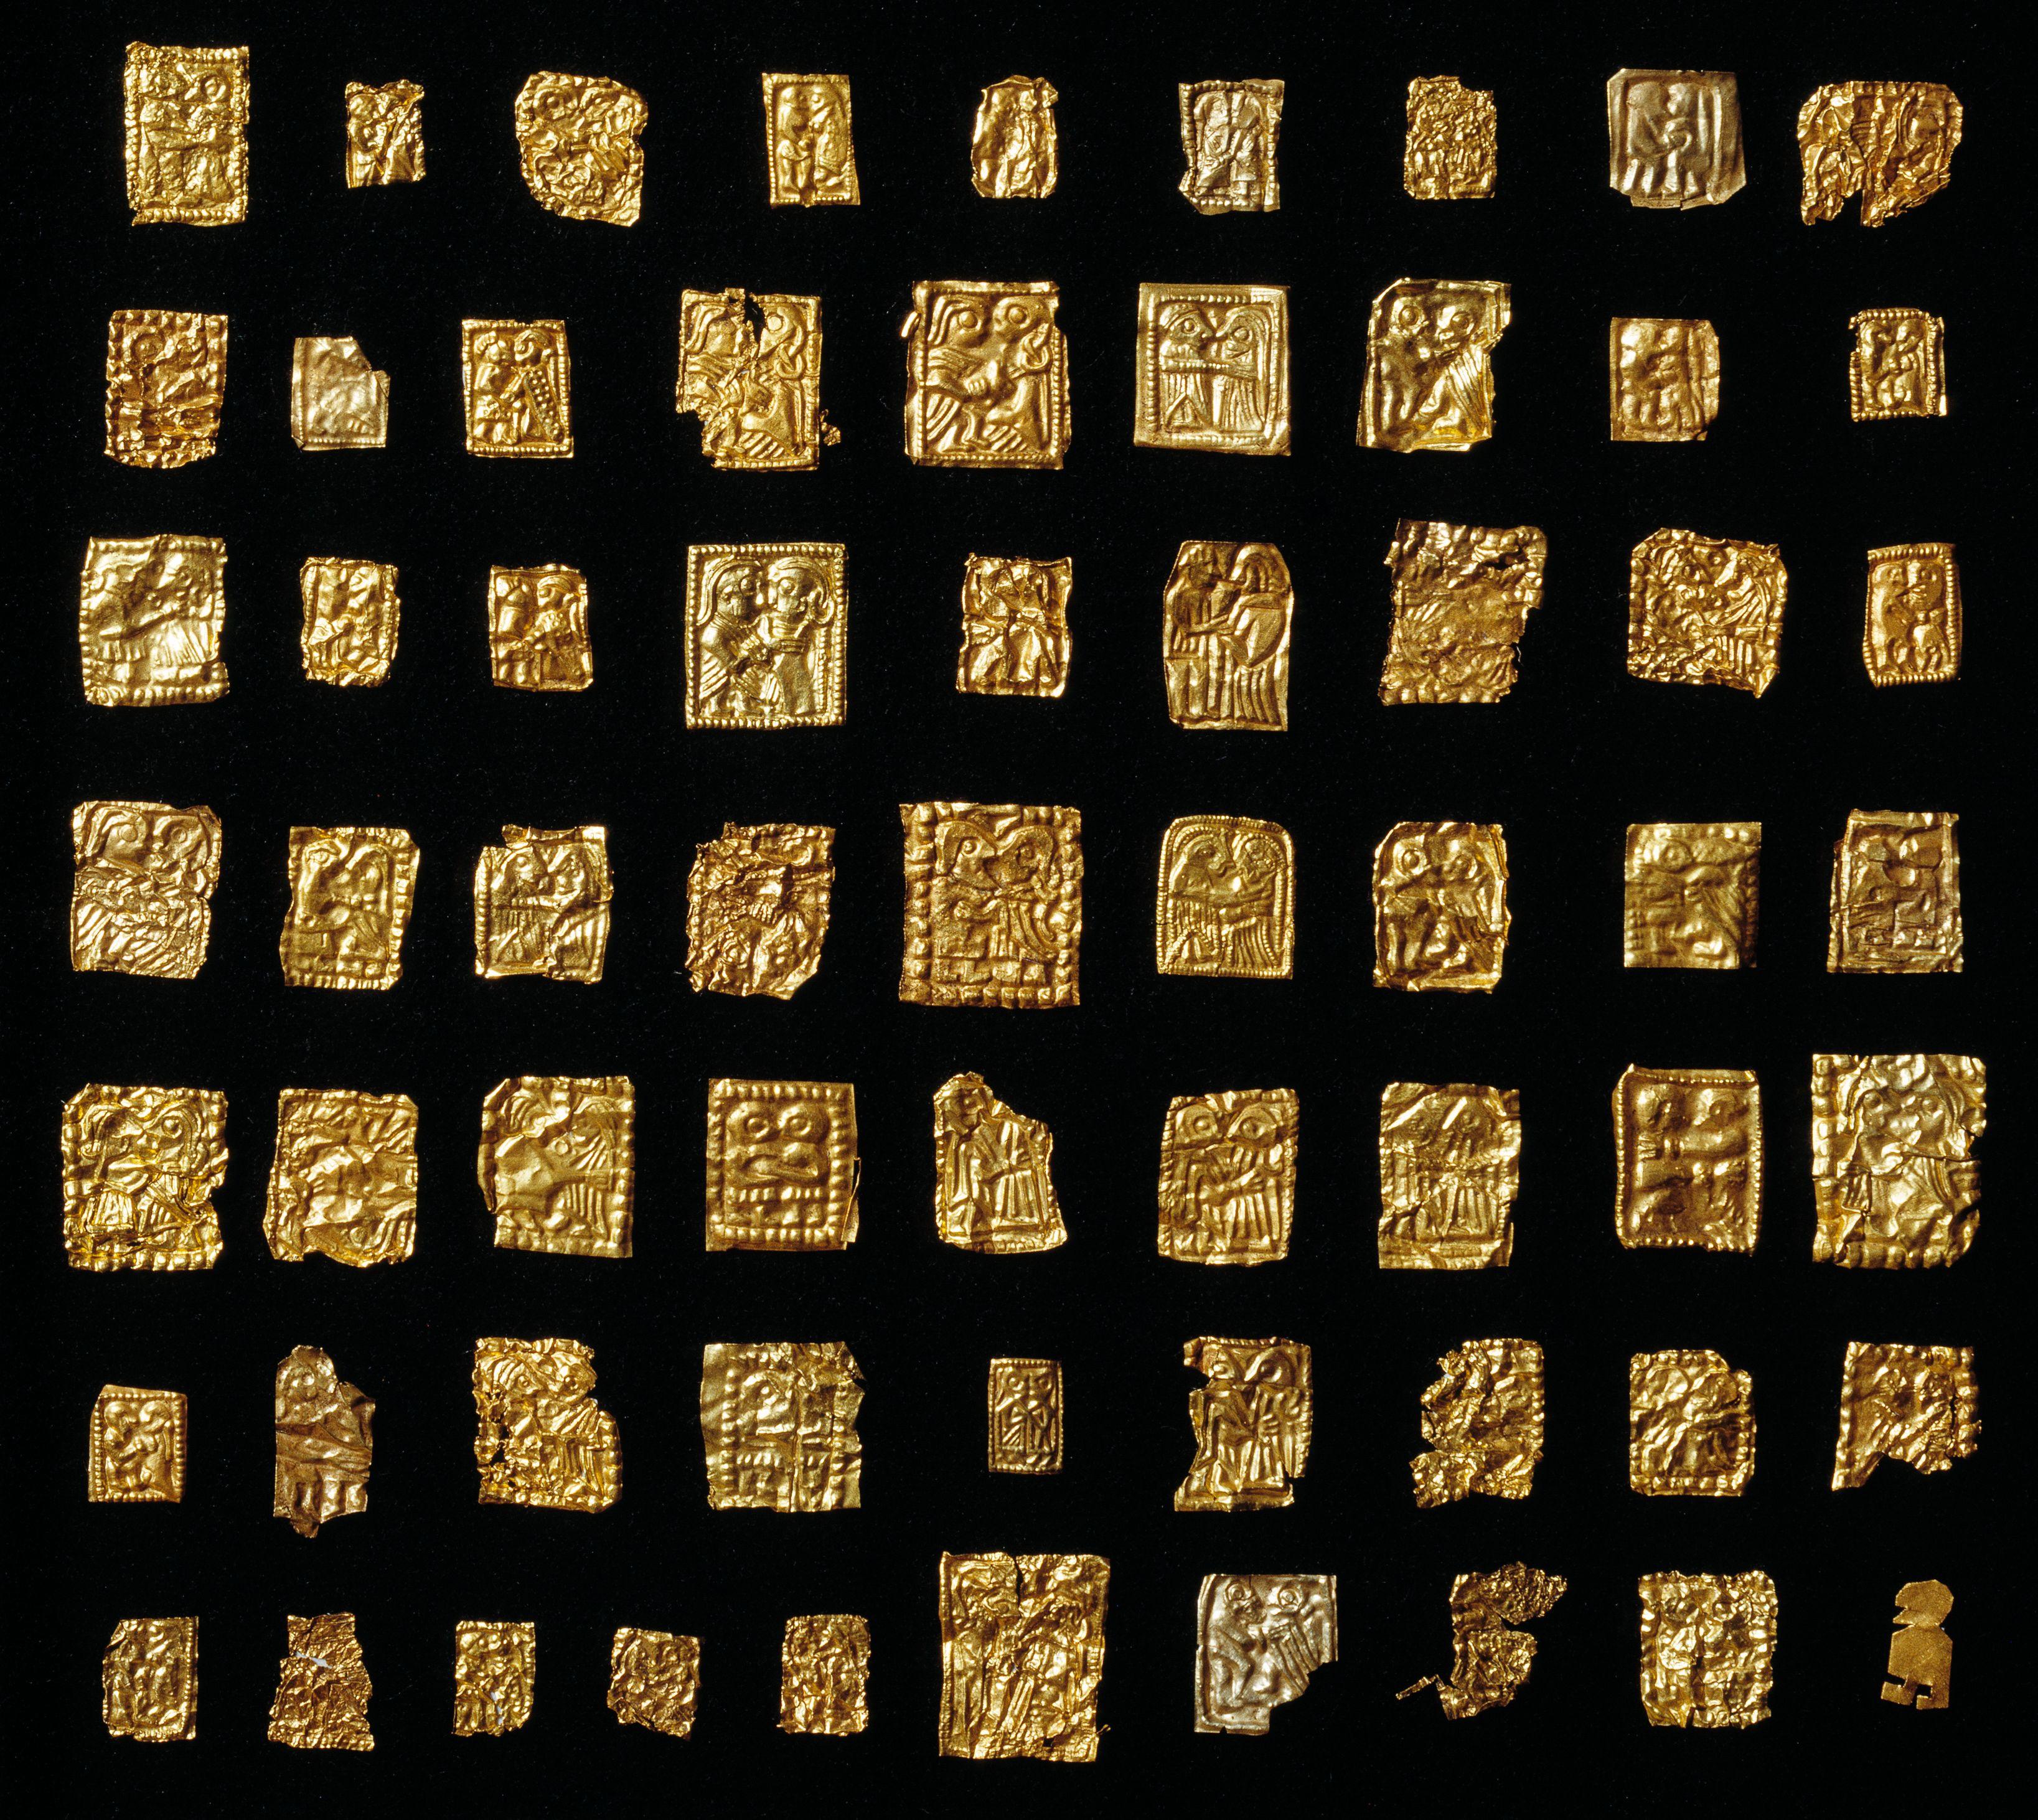 Fil:Guldgubber Lundeborg DO-10694 original.jpg - Wikipedia, den frie  encyklopædi